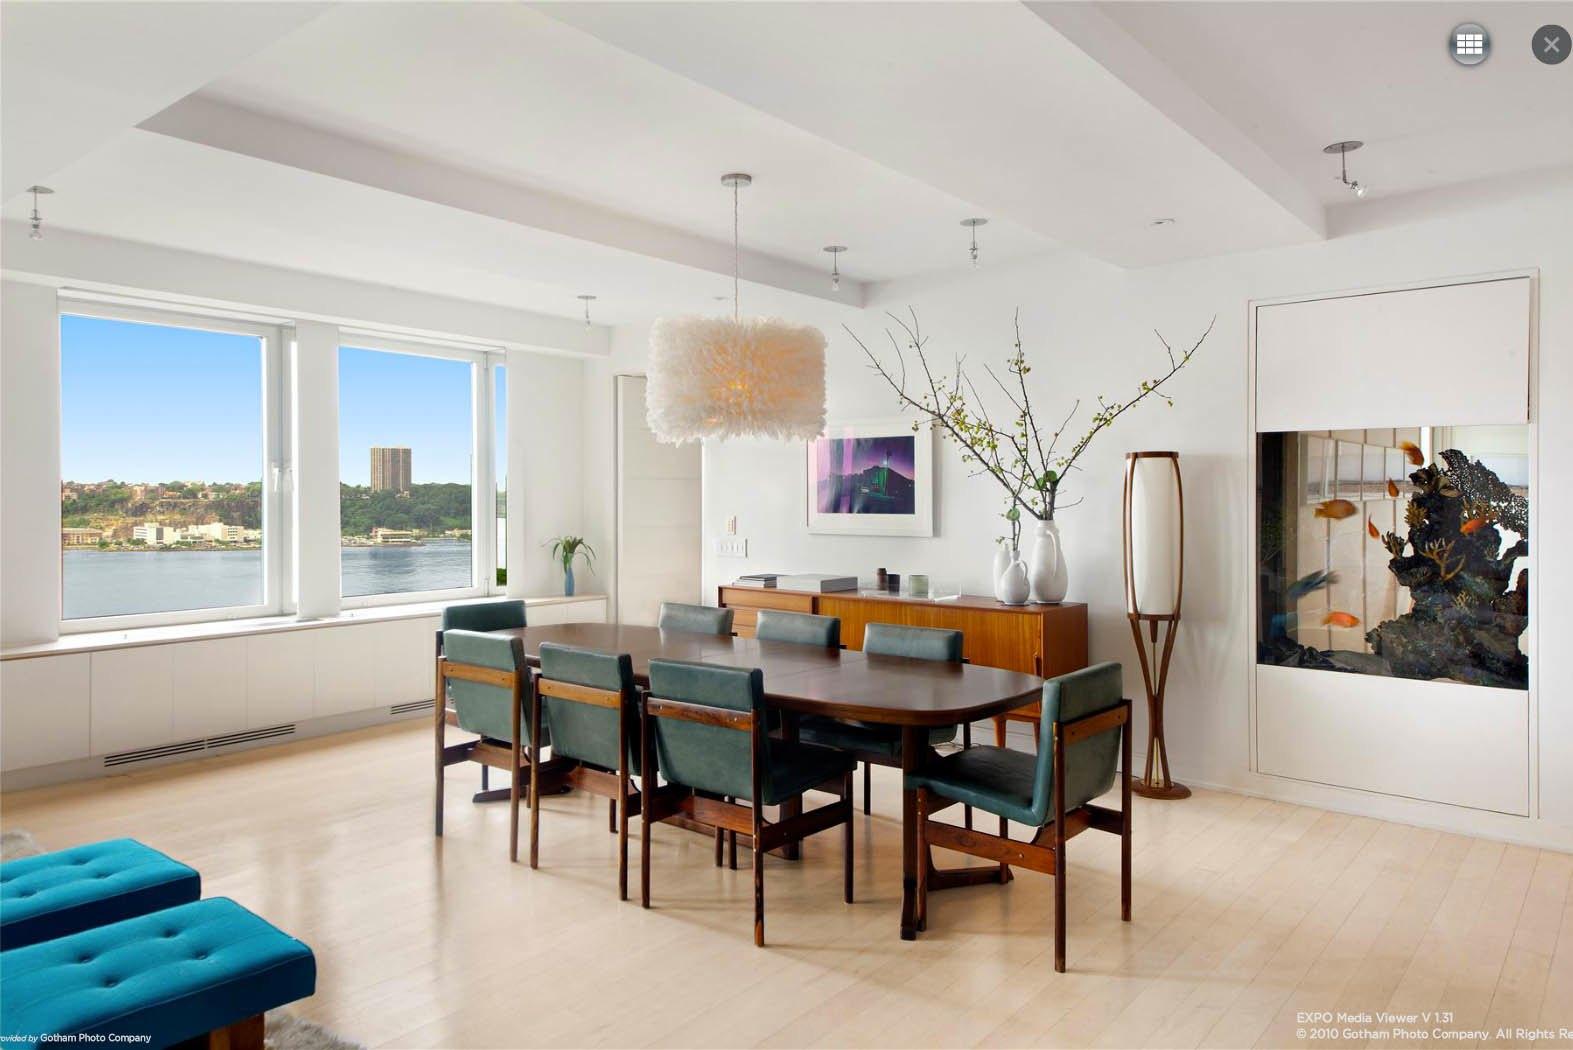 Ben Stiller Apartment At 118 Riverside Drive Dining Room